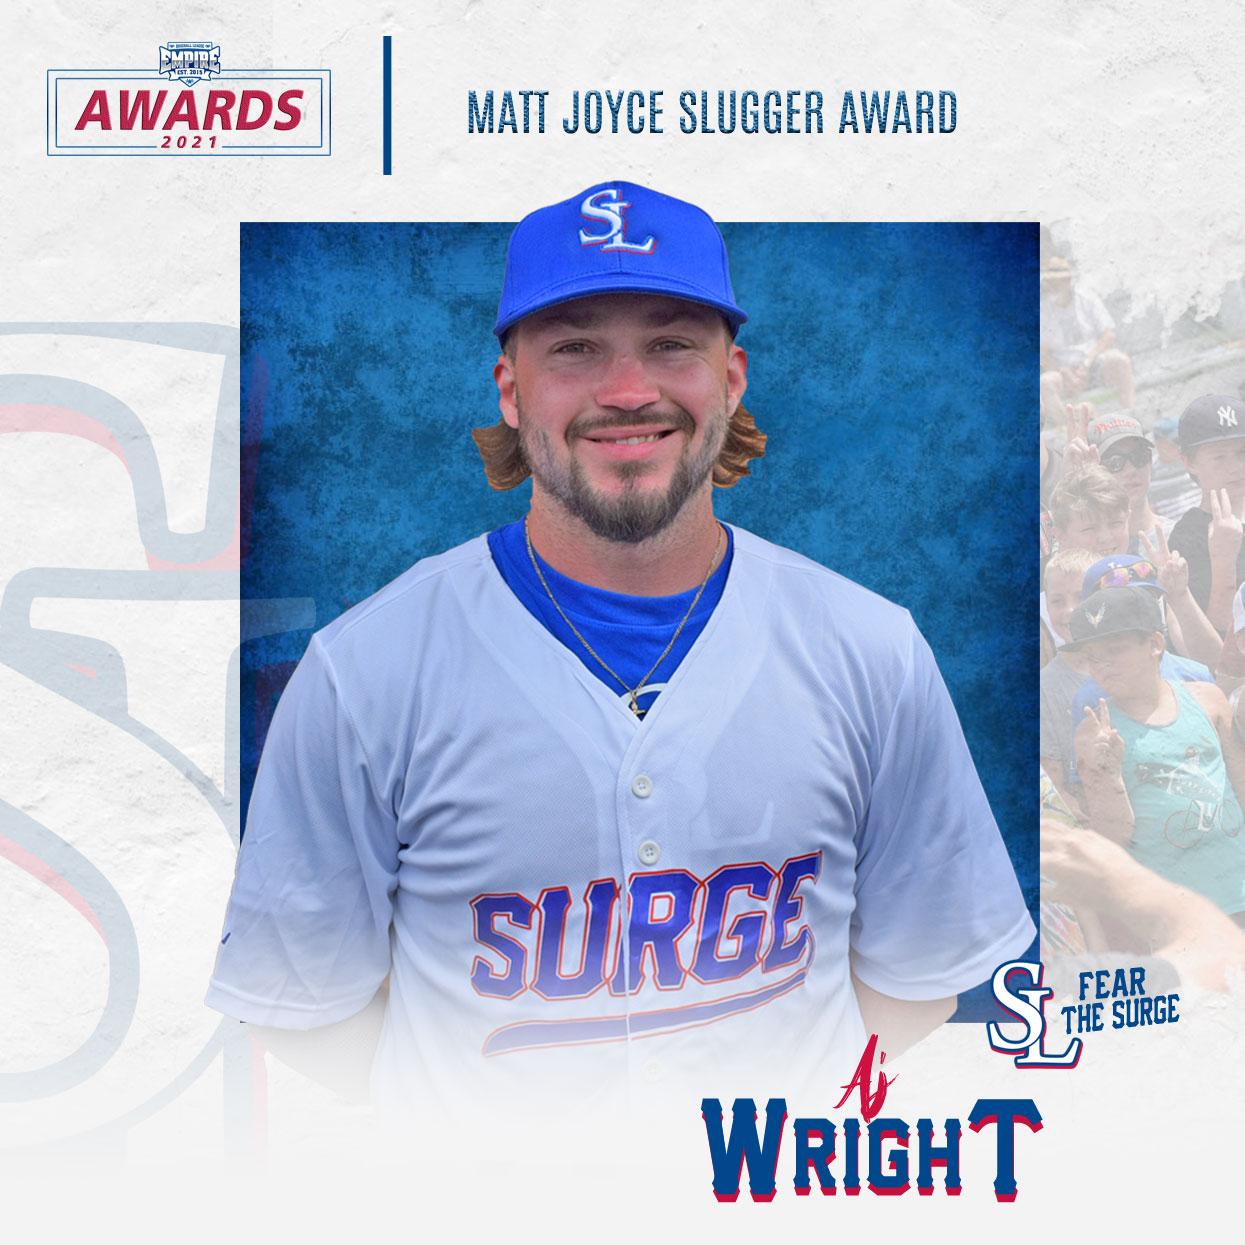 Awards-Matt-Joyce-Silver-Slugger2